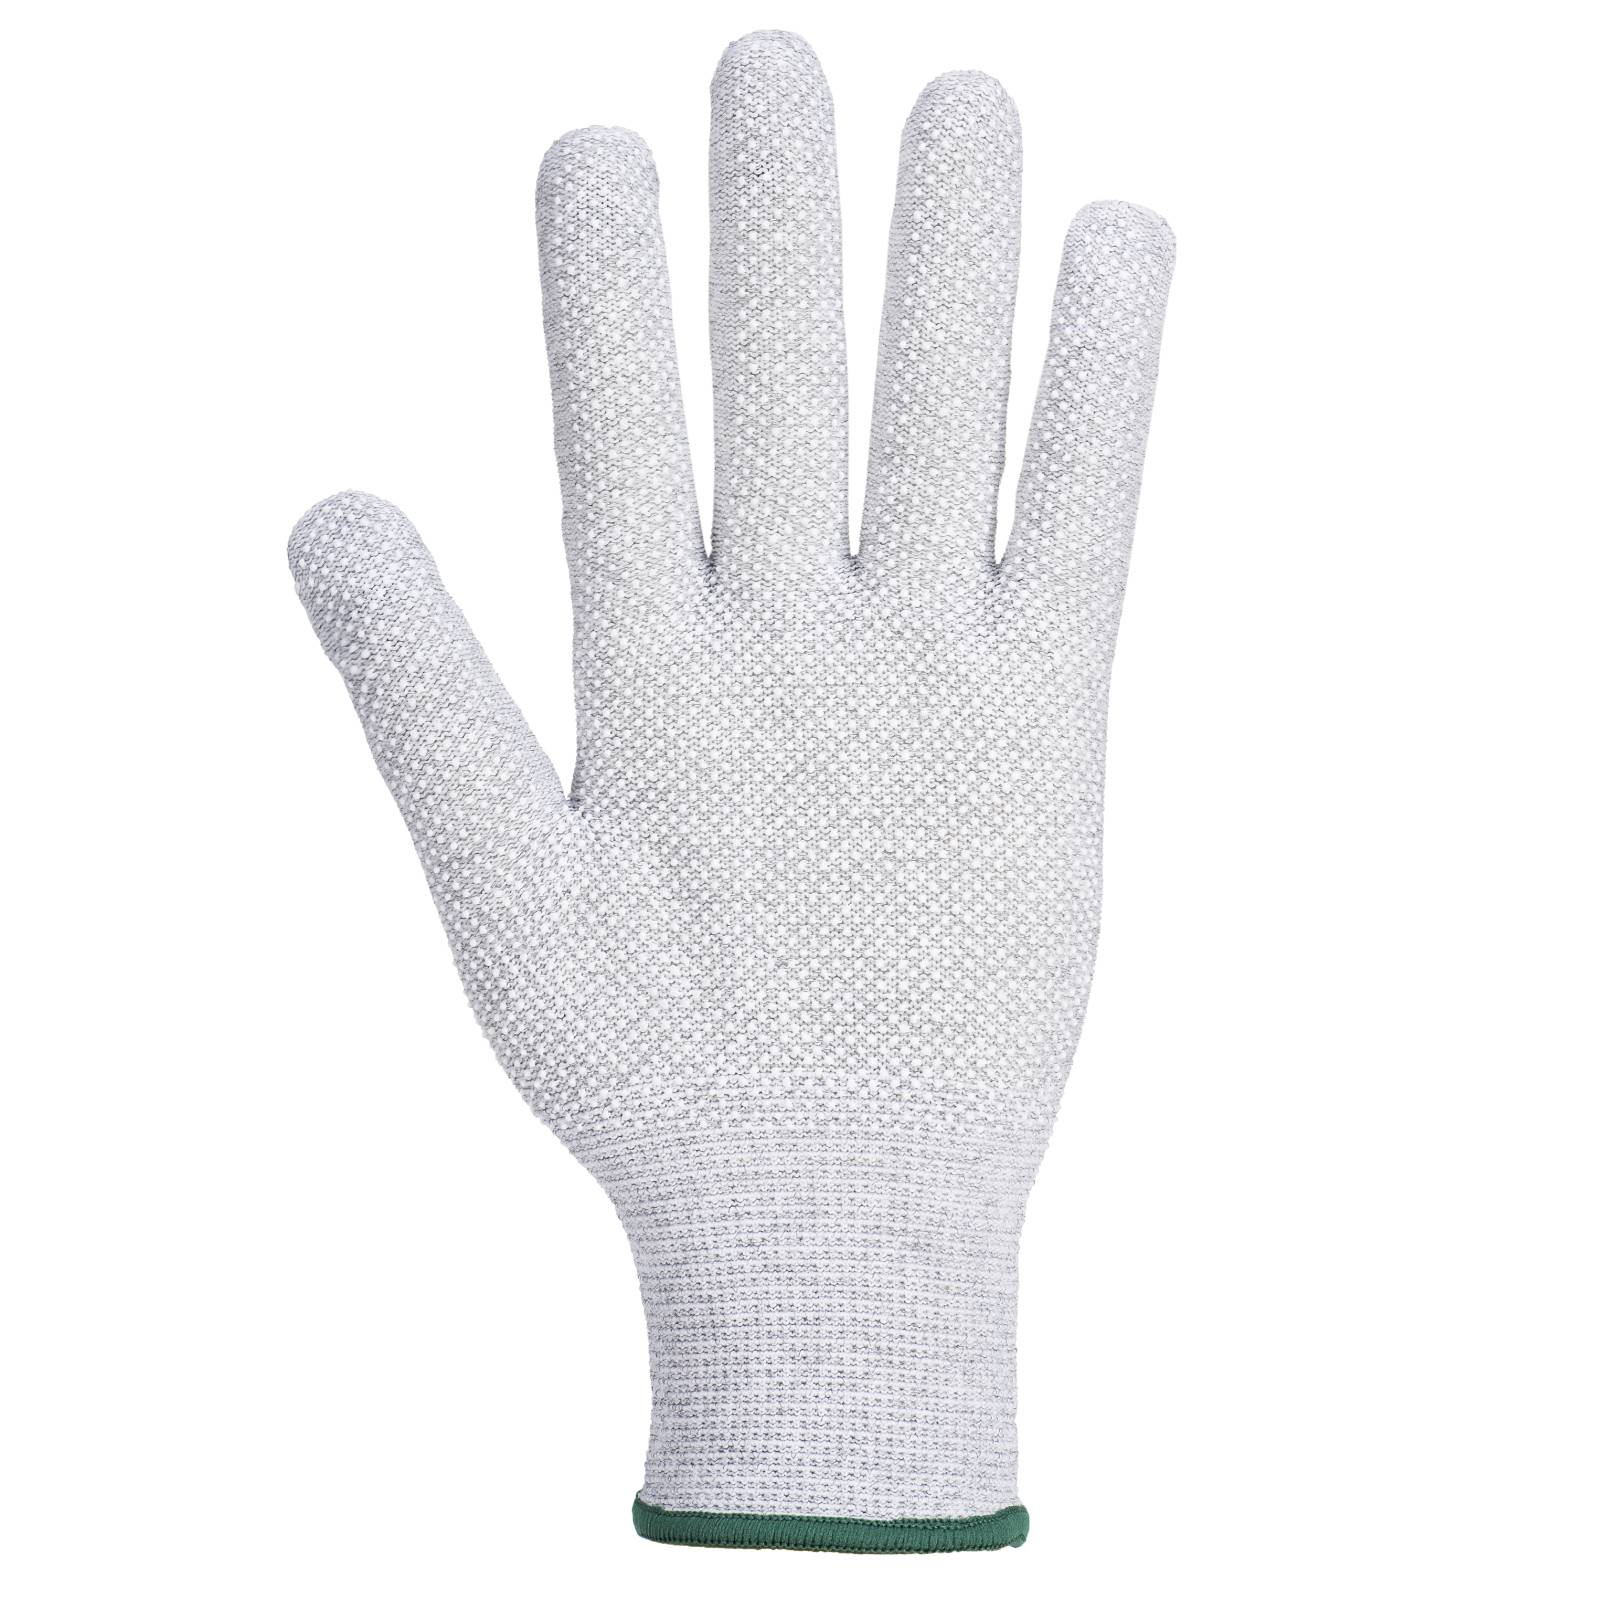 Portwest Handschoenen A196 grijs-wit(G6)